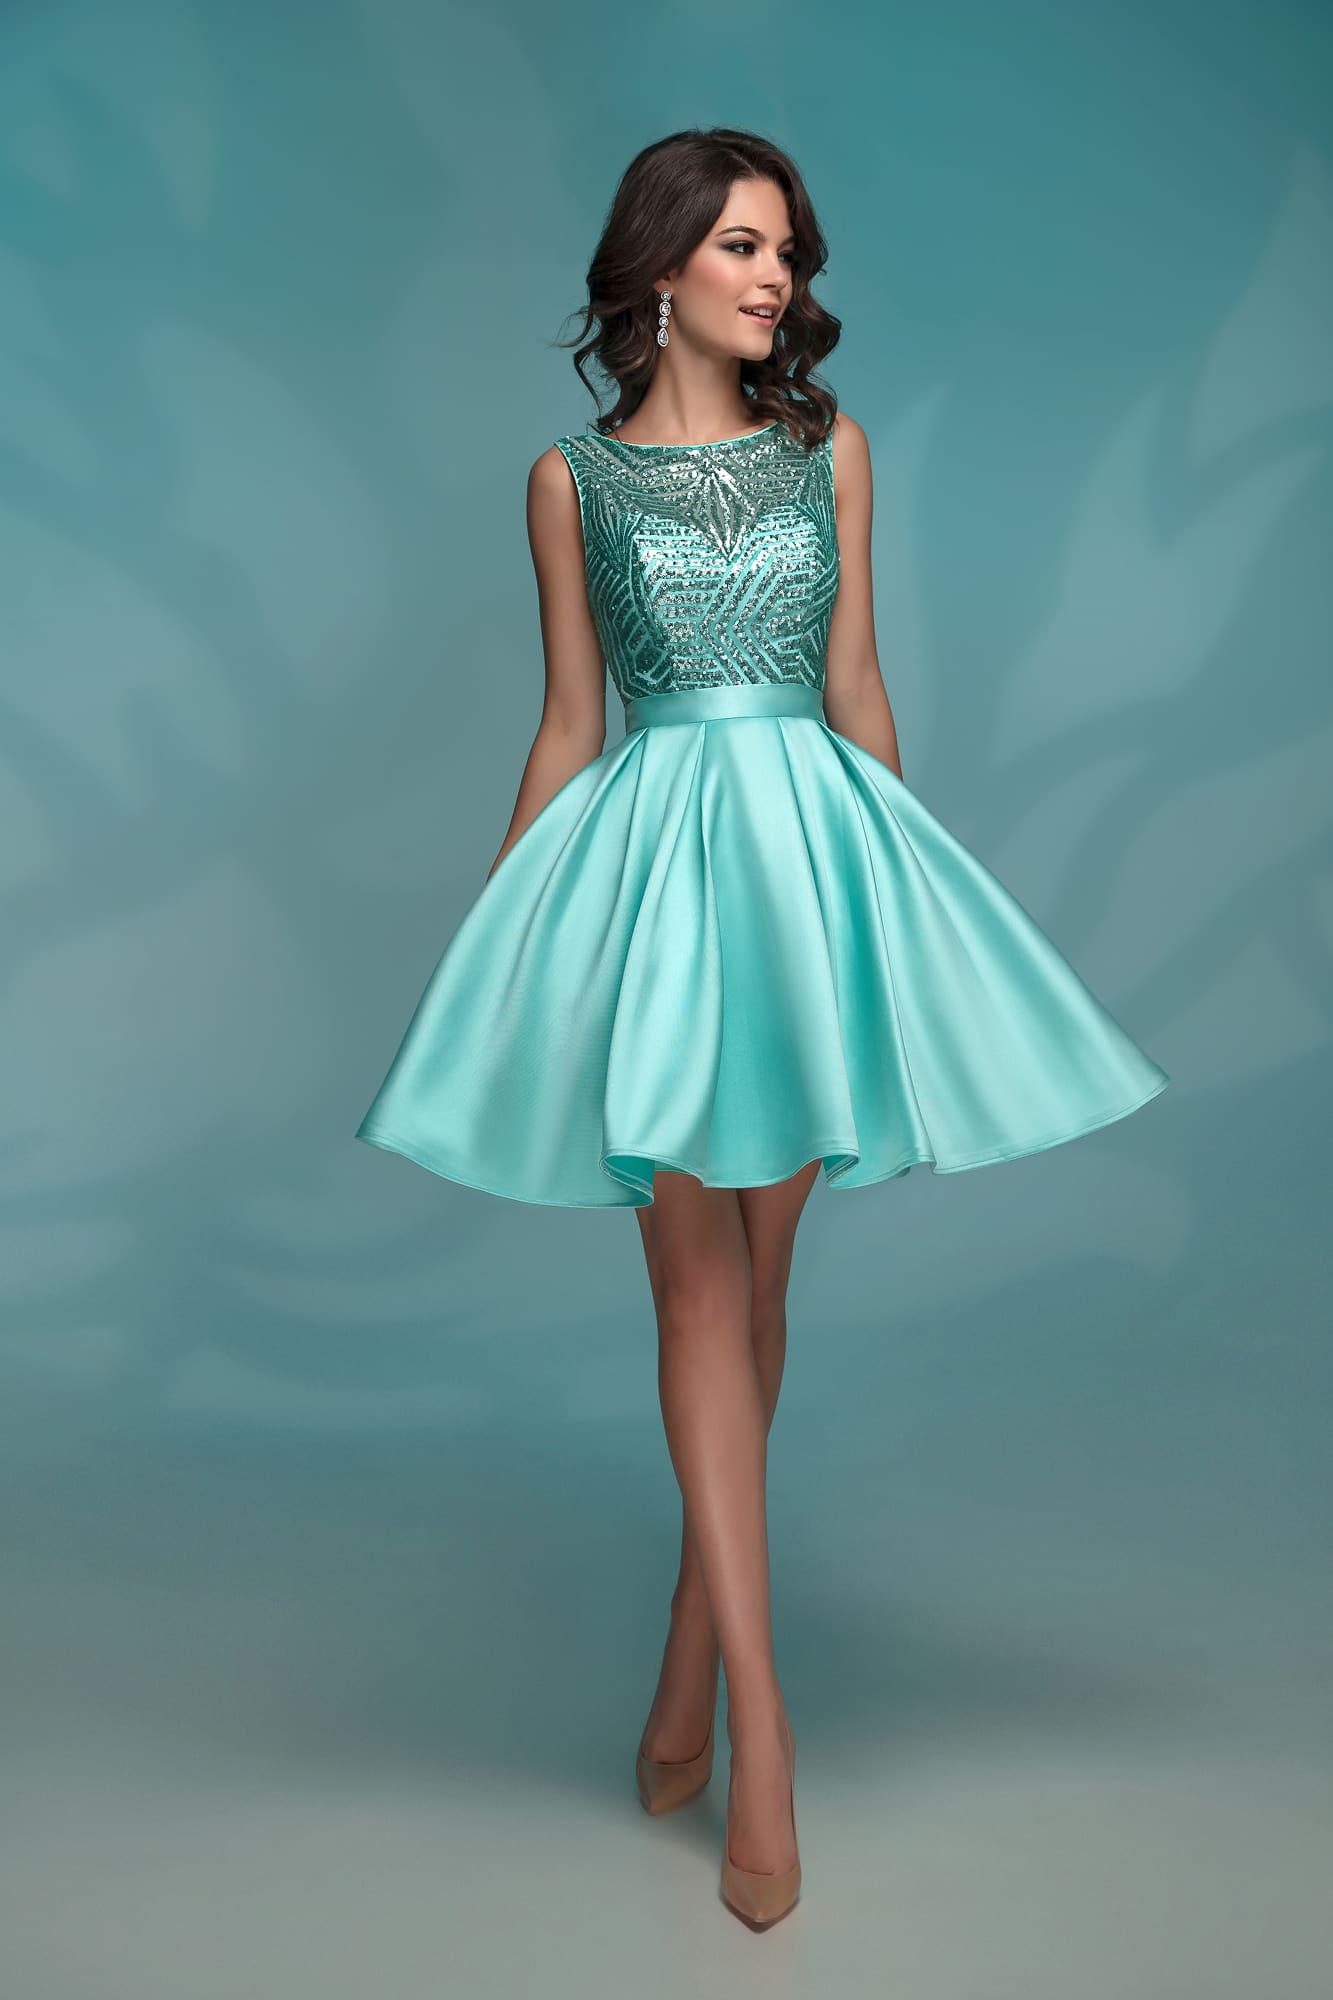 8912b793e3d Бирюзовое выпускное платье Nora Naviano 72034 mint. Купить вечернее ...